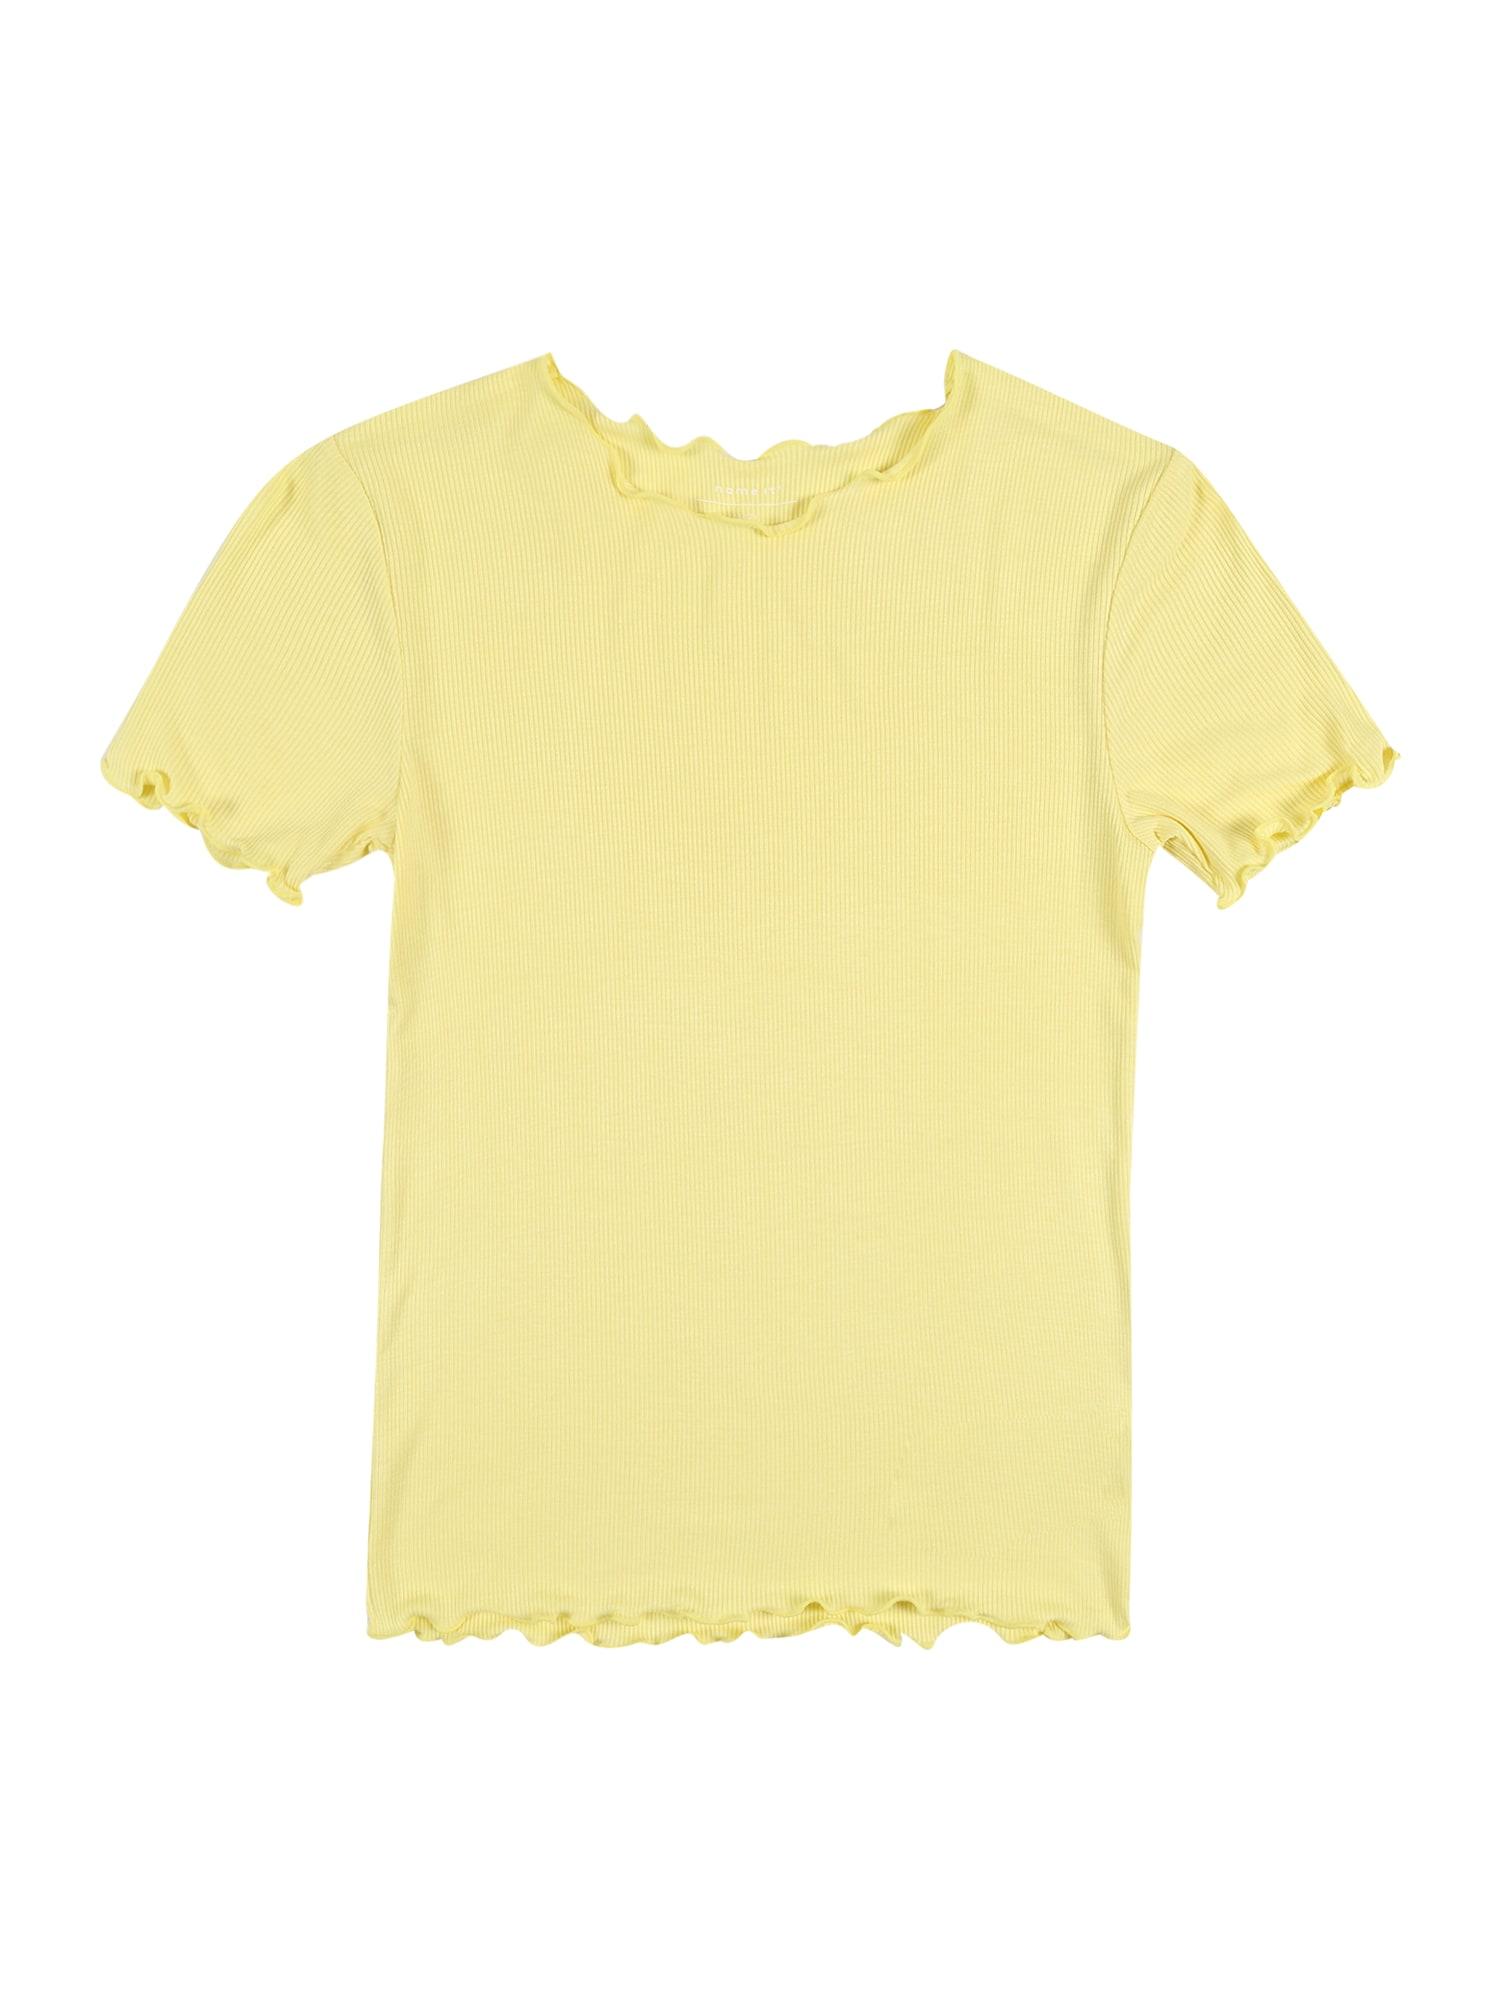 NAME IT Marškinėliai 'Elisa' geltona